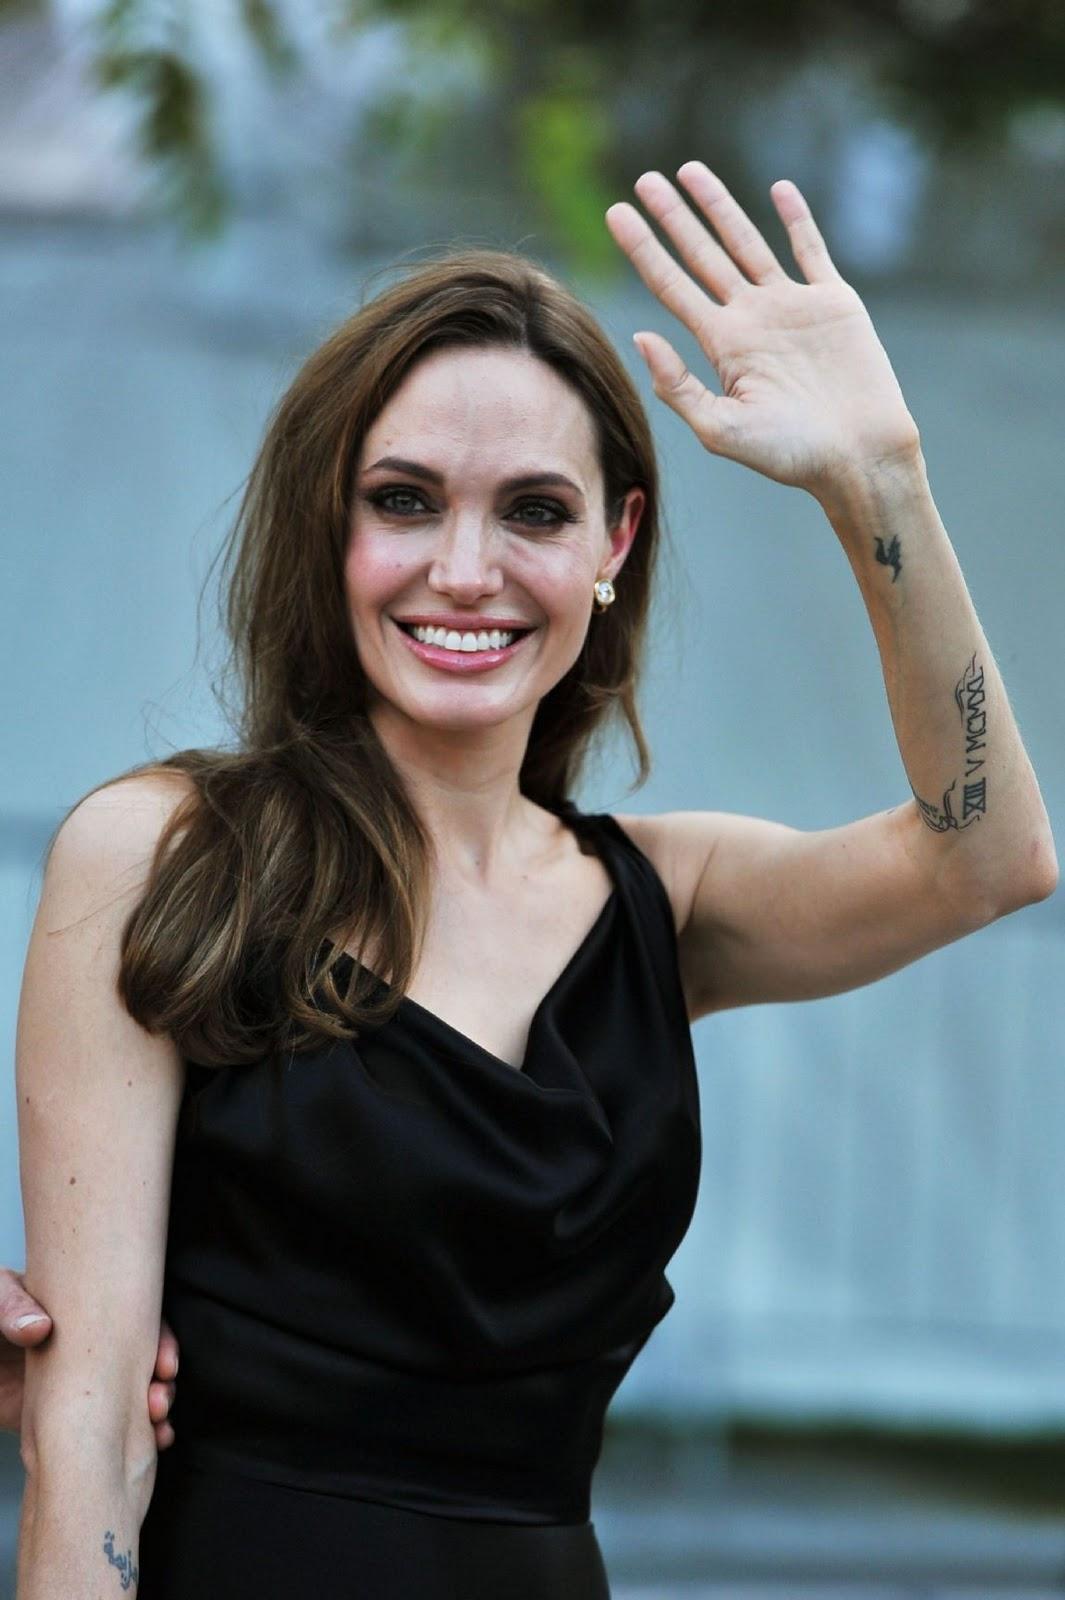 http://4.bp.blogspot.com/--pn-4u4FUk0/ToH3Fsd8DrI/AAAAAAAAEJg/K3nEQ5_aeI0/s1600/Angelina+Jolie+at+Moneyball+Premiere+%25E2%2580%2593+wearing+Vivienne+Westwood+%25283%2529.jpg